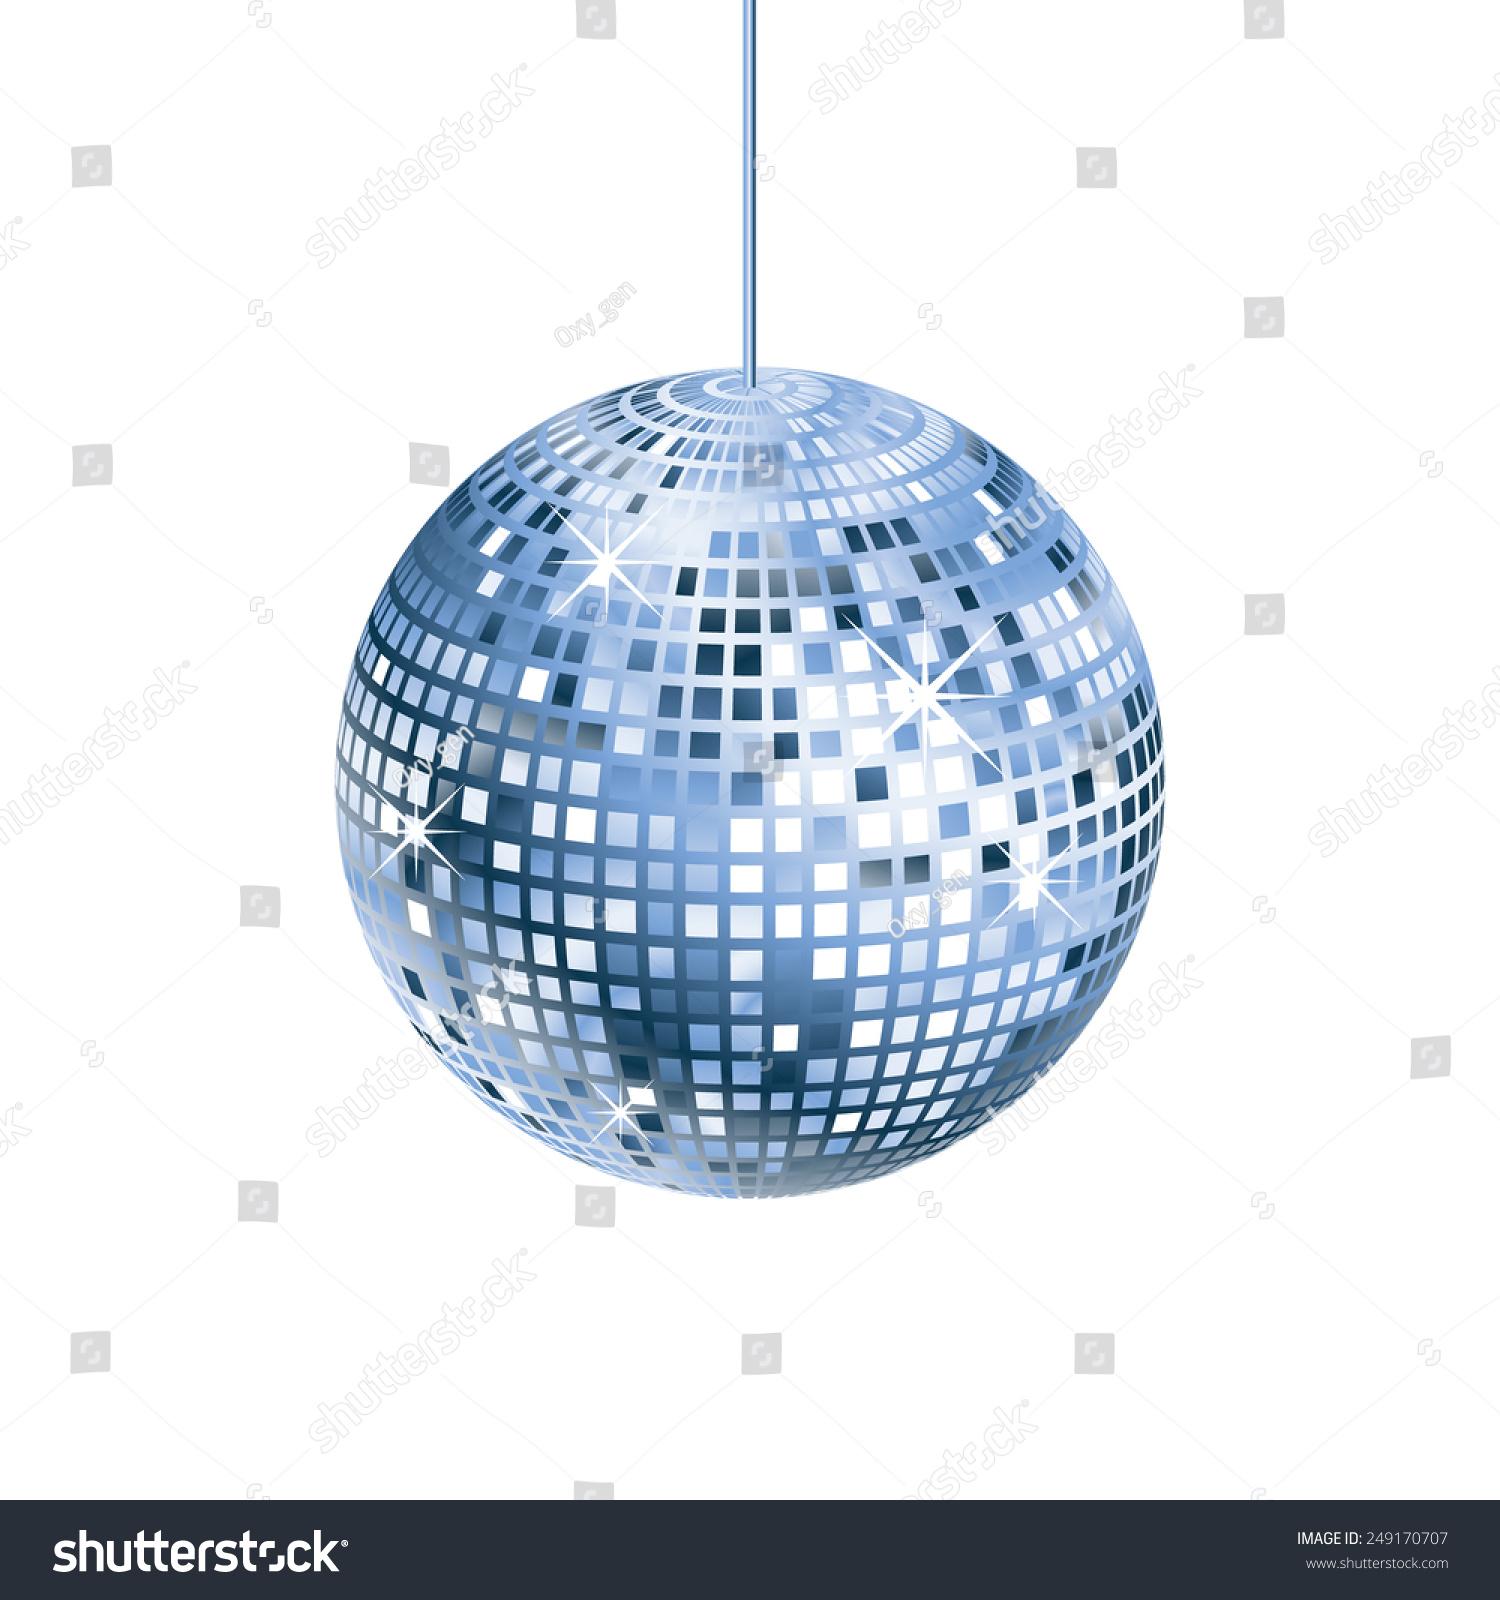 silver disco ball background - photo #15